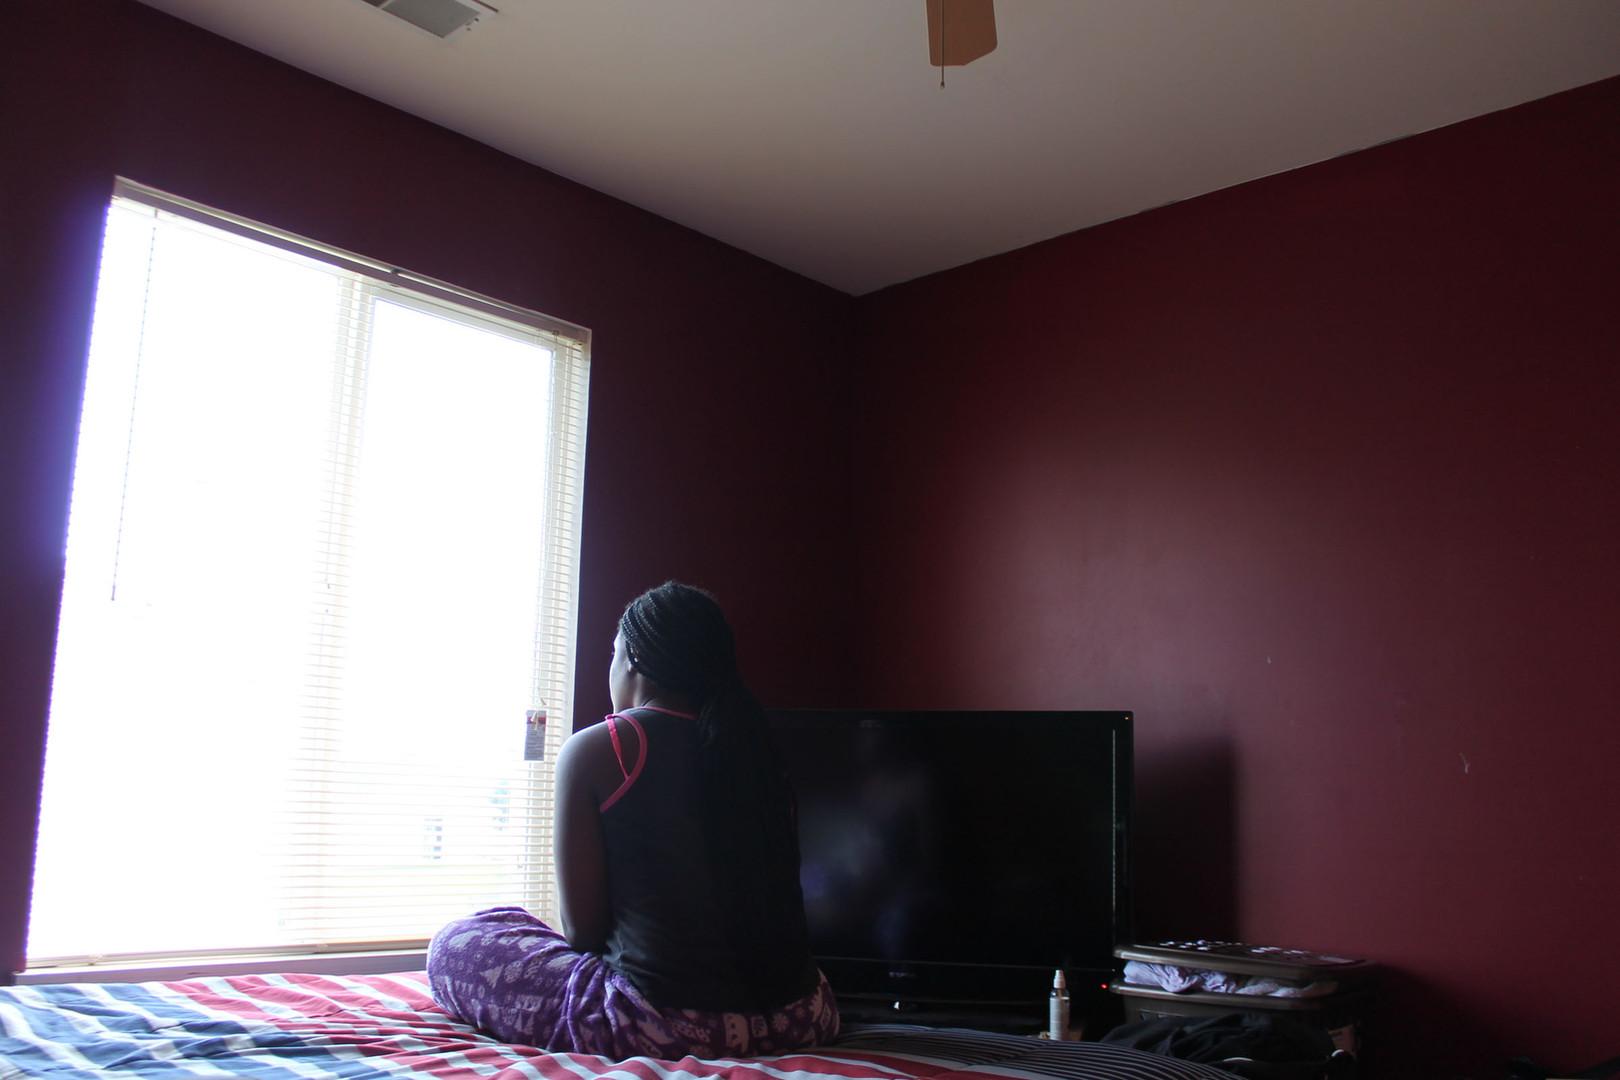 Silent Scream (Self-Portrait), Dashara M